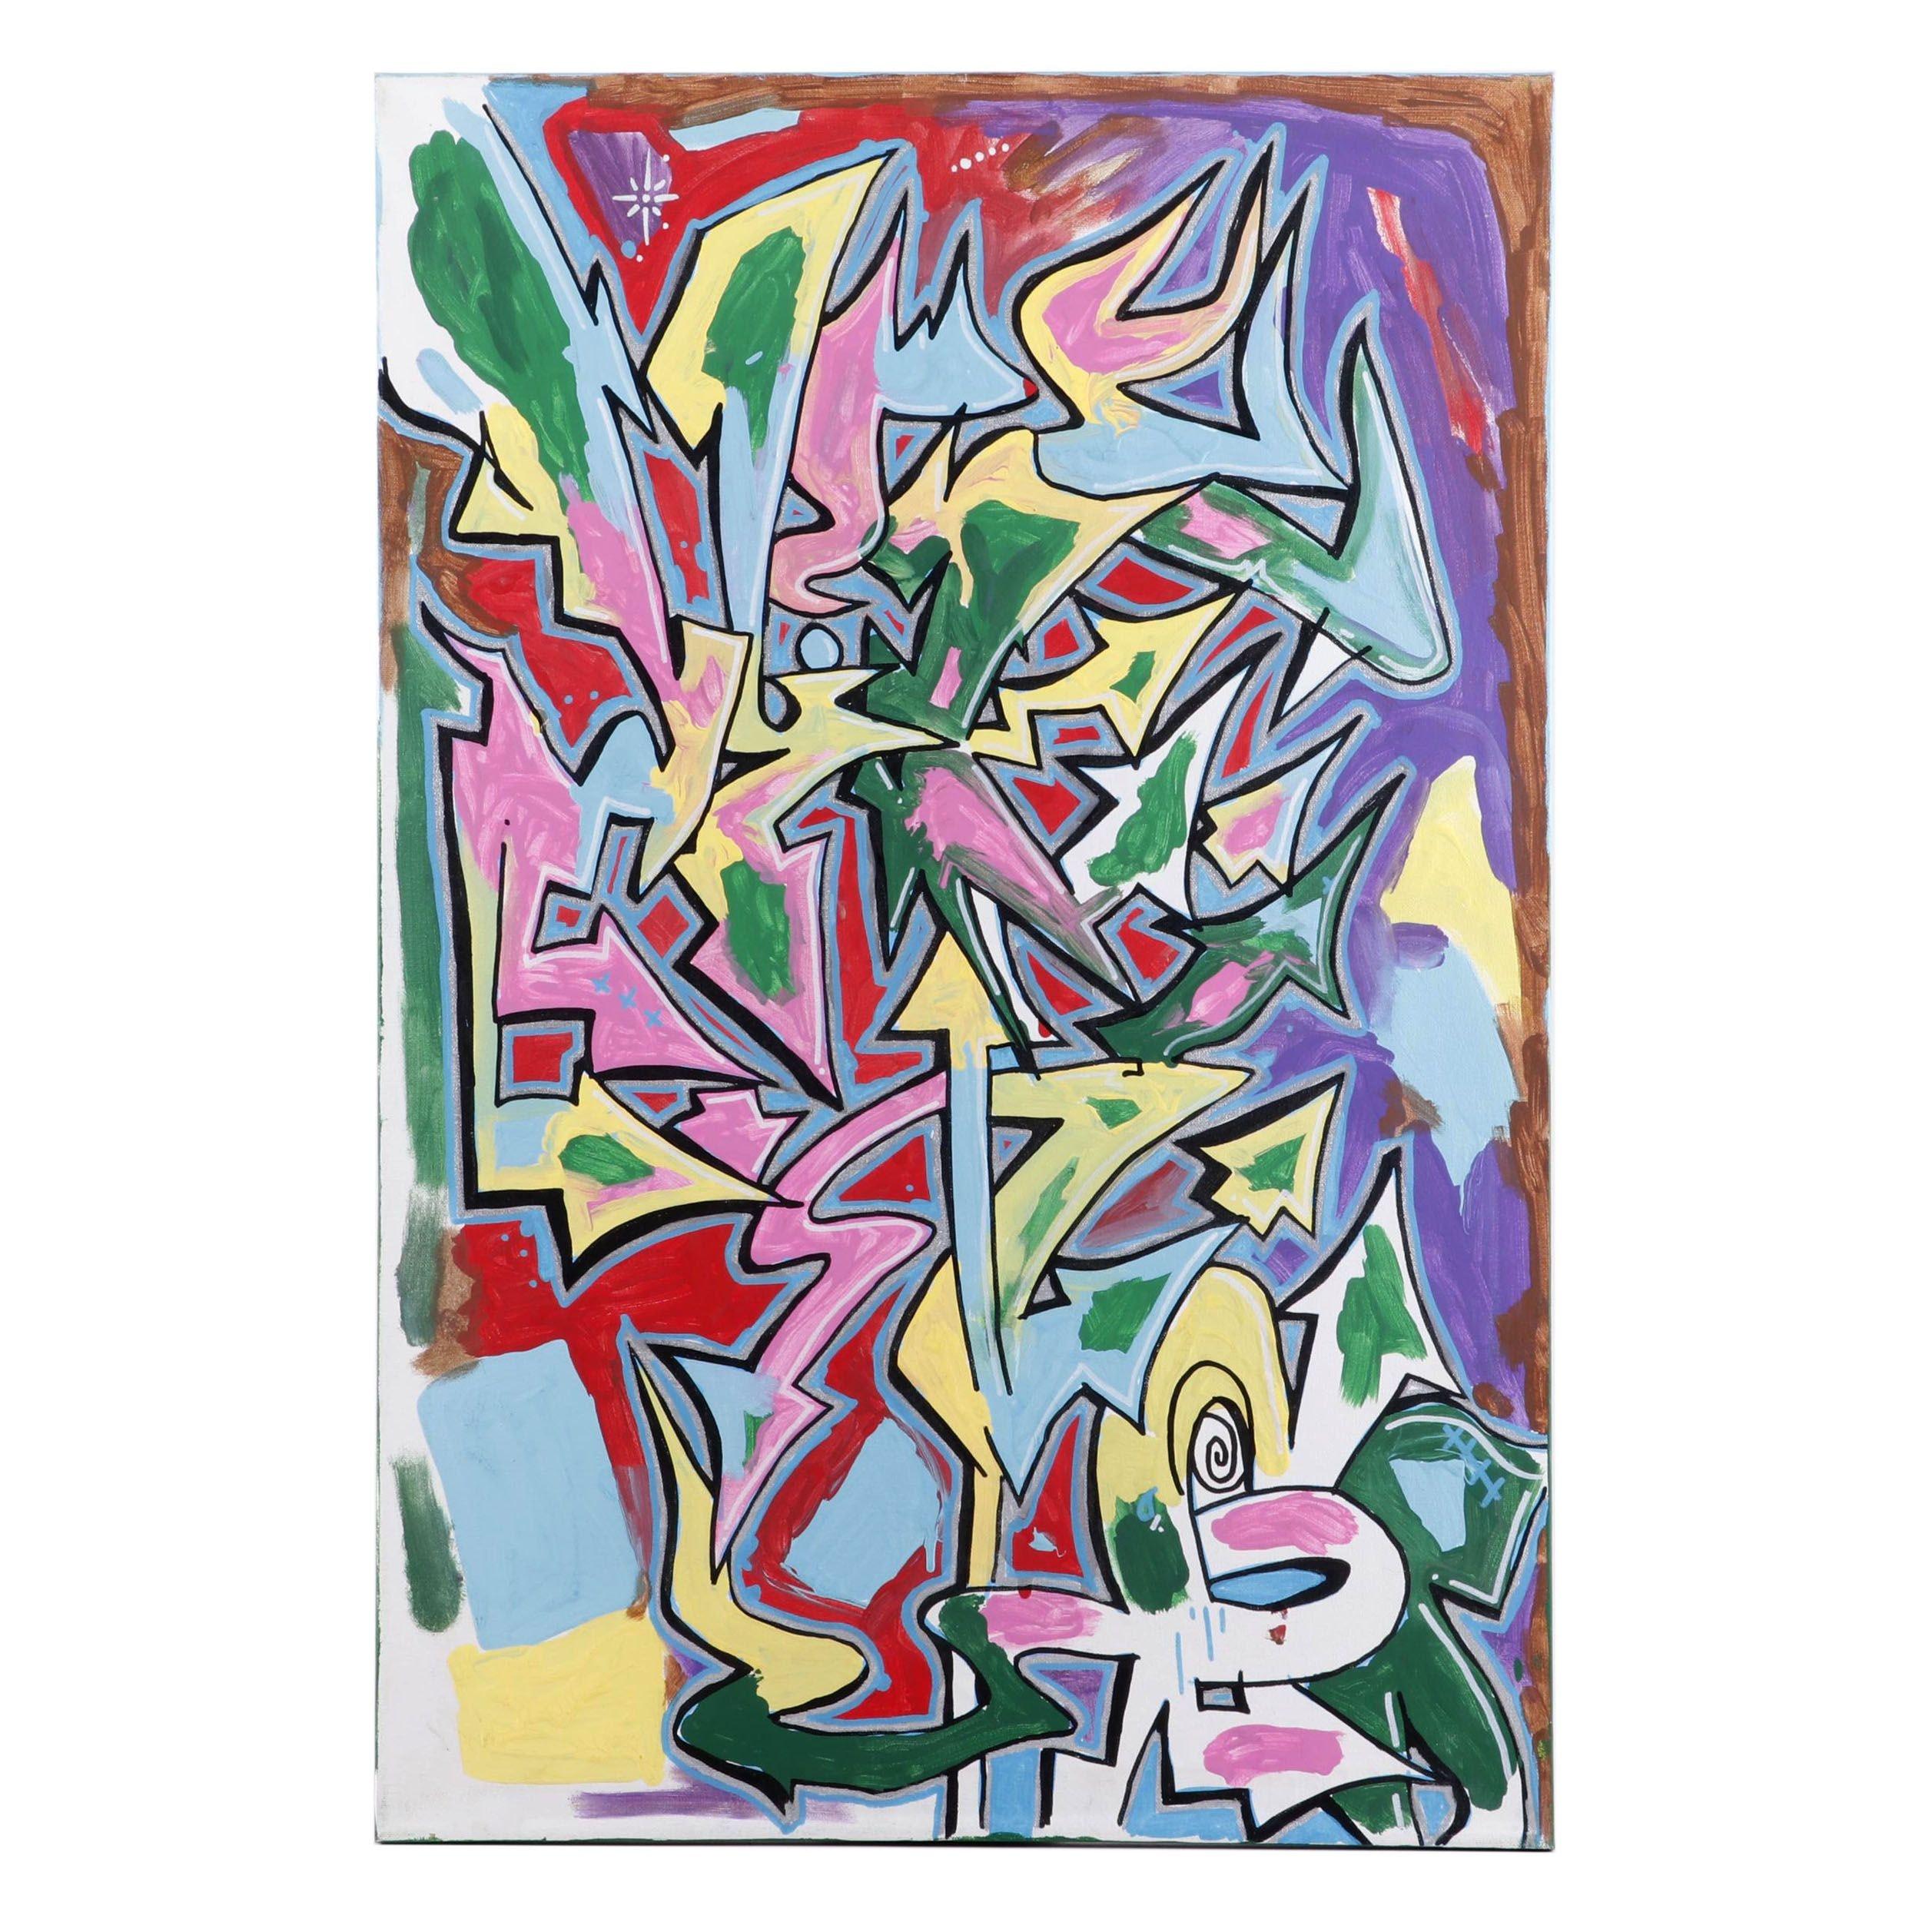 Abstract Graffiti Style Acrylic Painting